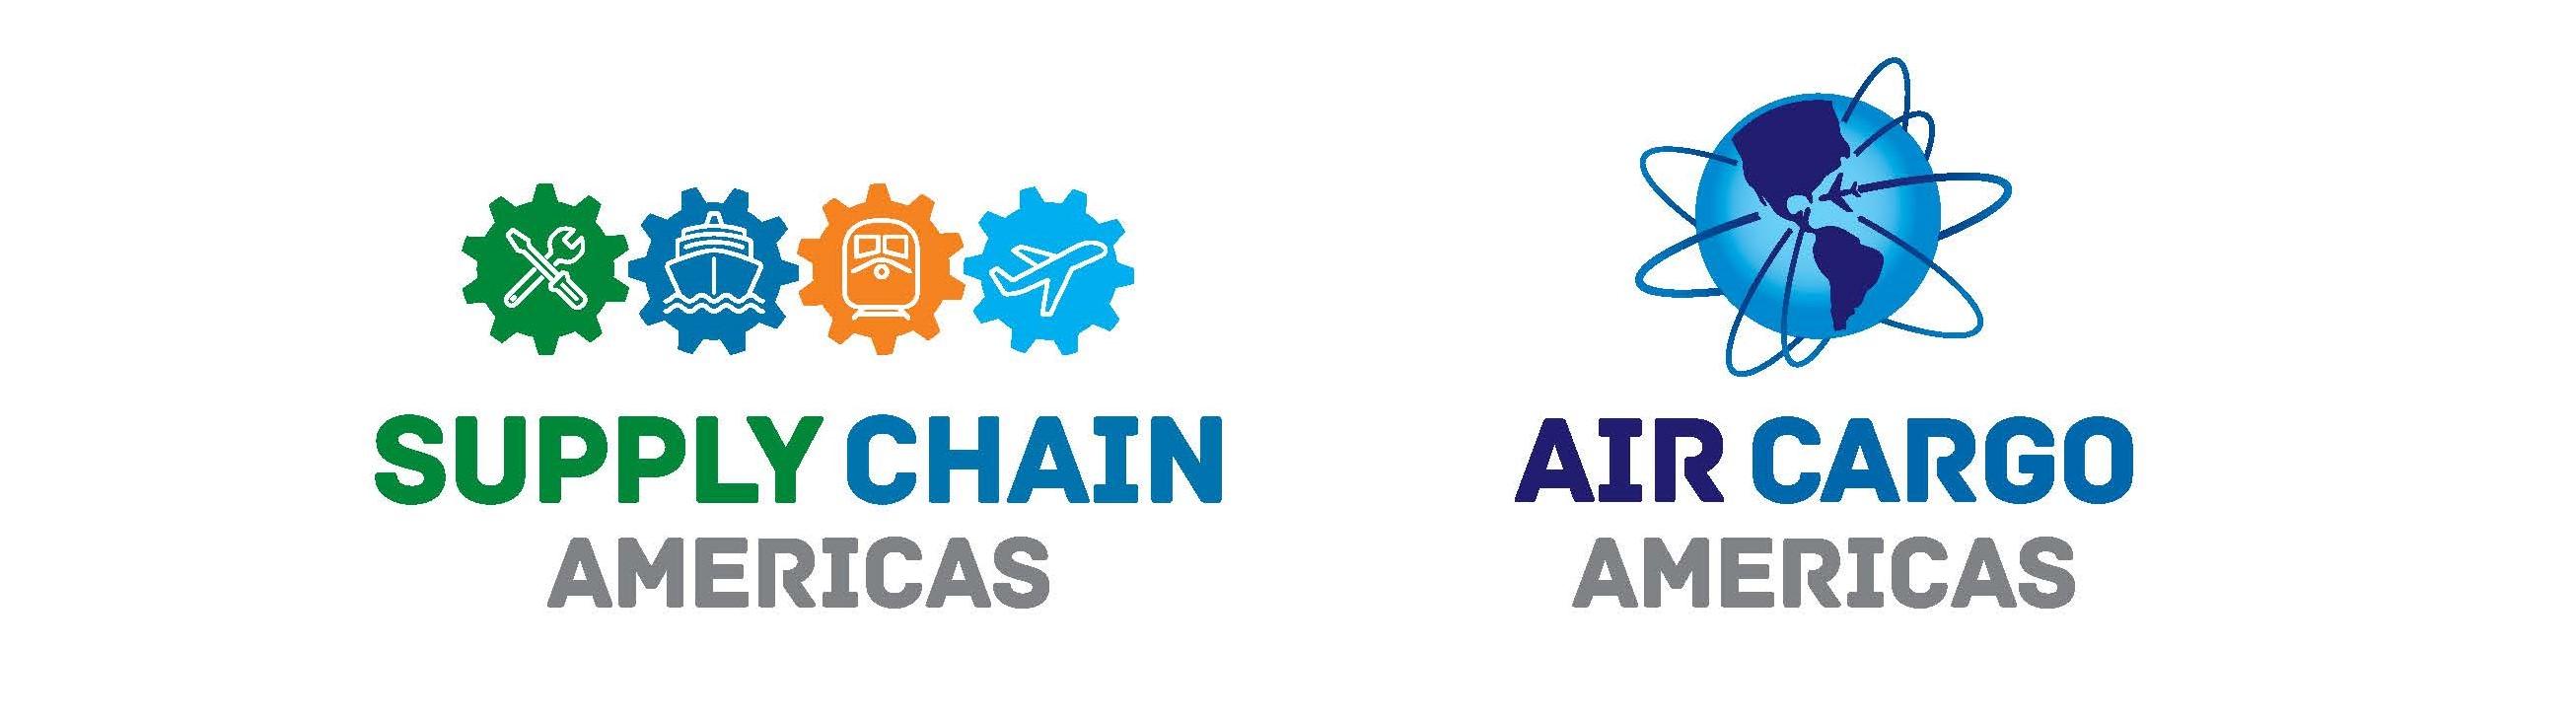 ACA and SCA logos v1_Page_1